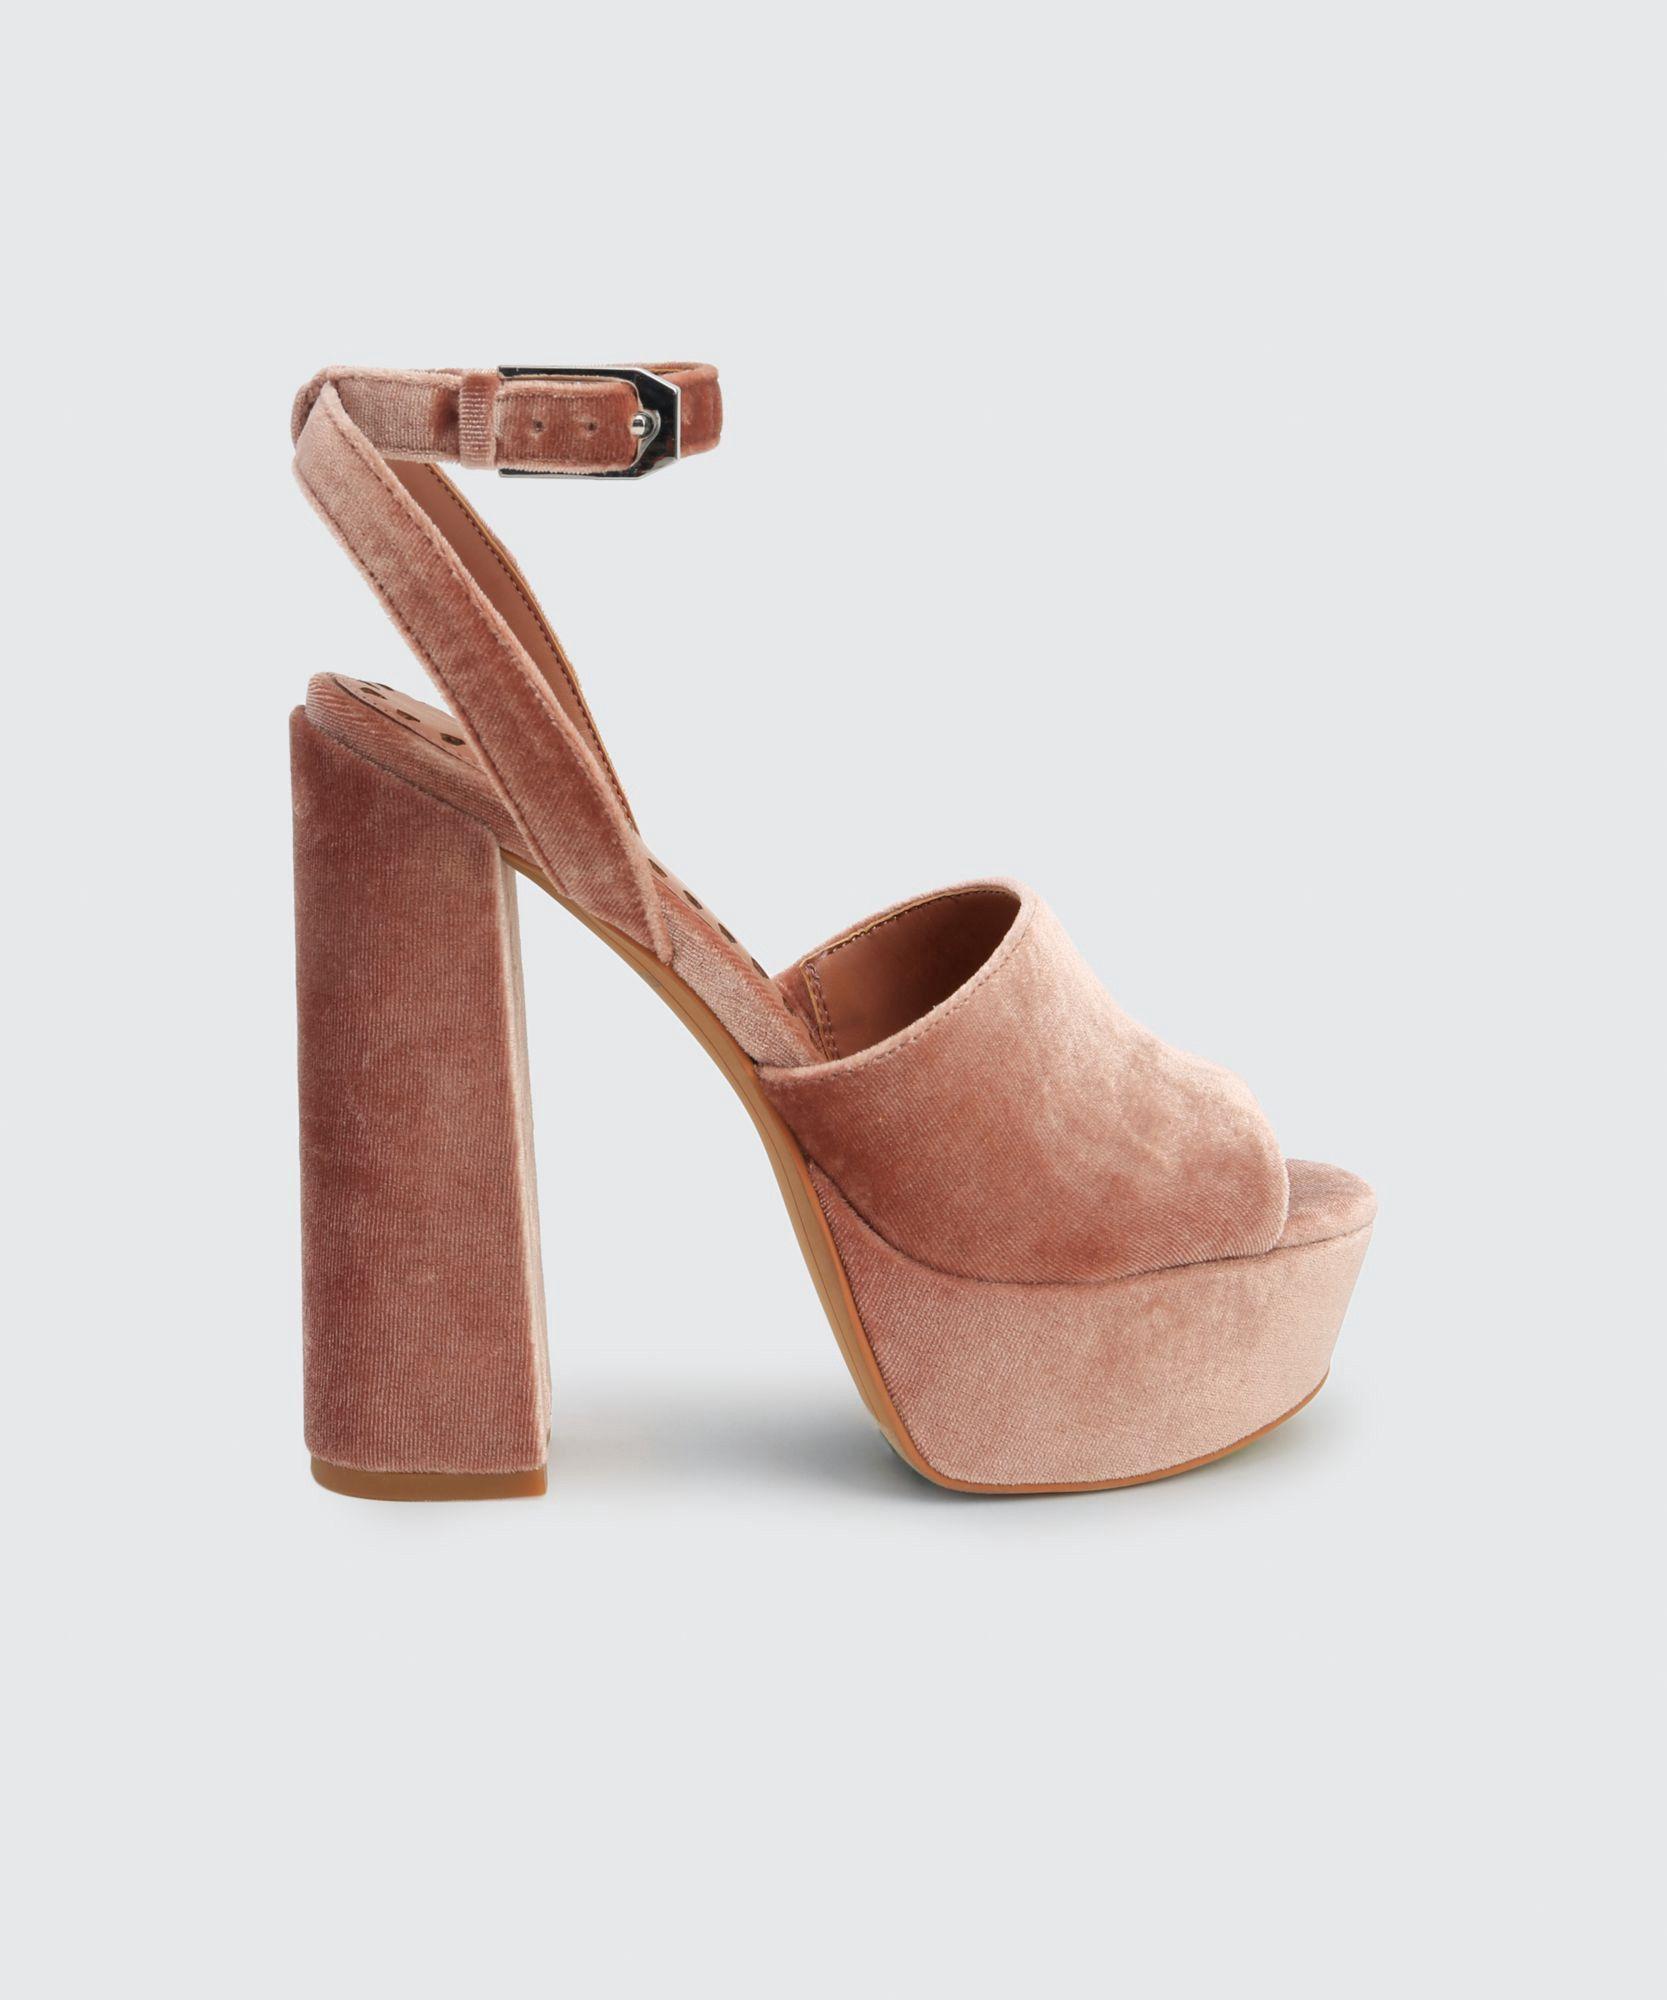 5a76c0fb072 DOLCE VITA LEELA HEELS. #dolcevita #shoes # | Dolce Vita | Heels ...